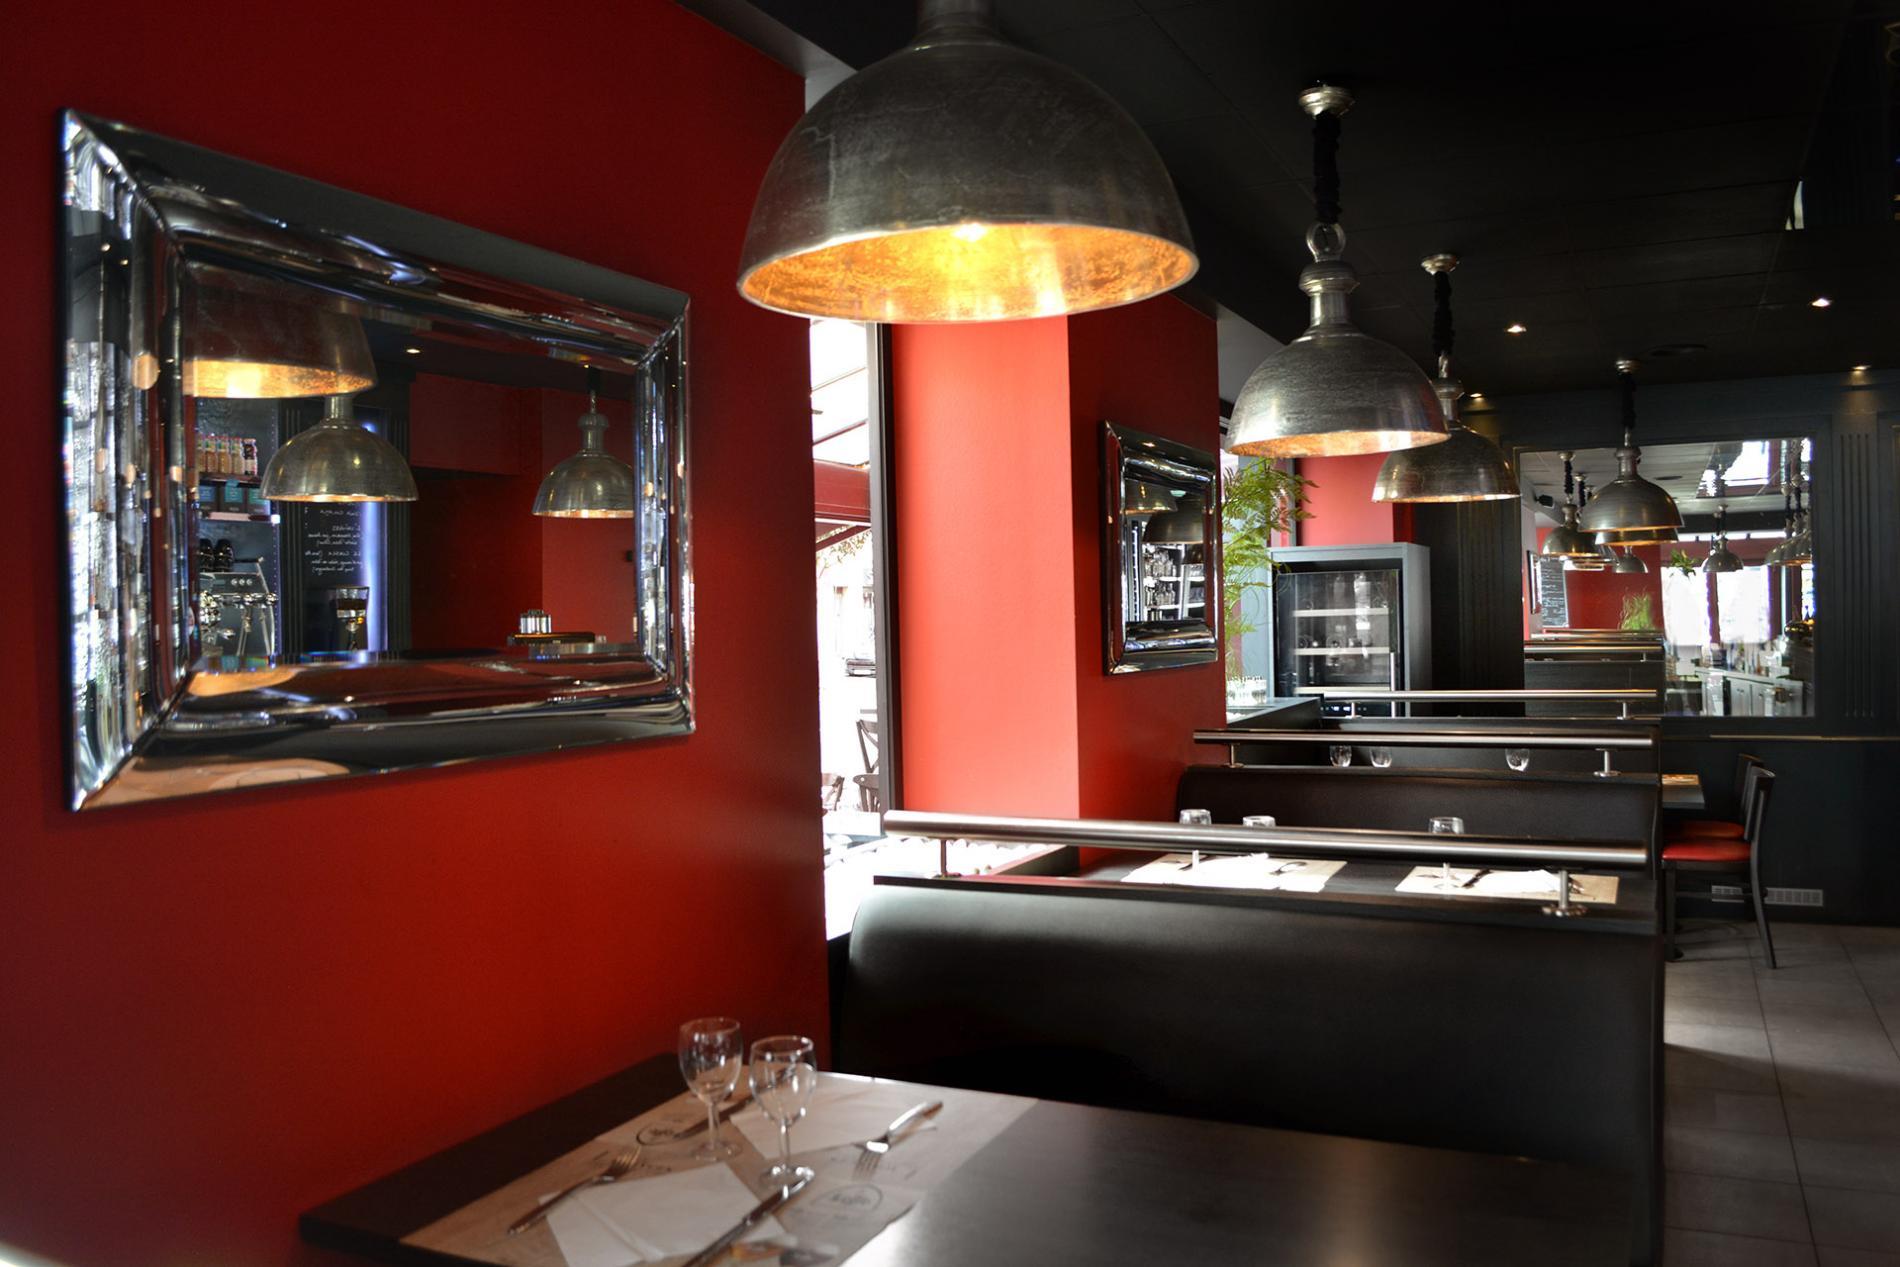 Brasserie de L'univers - Caen